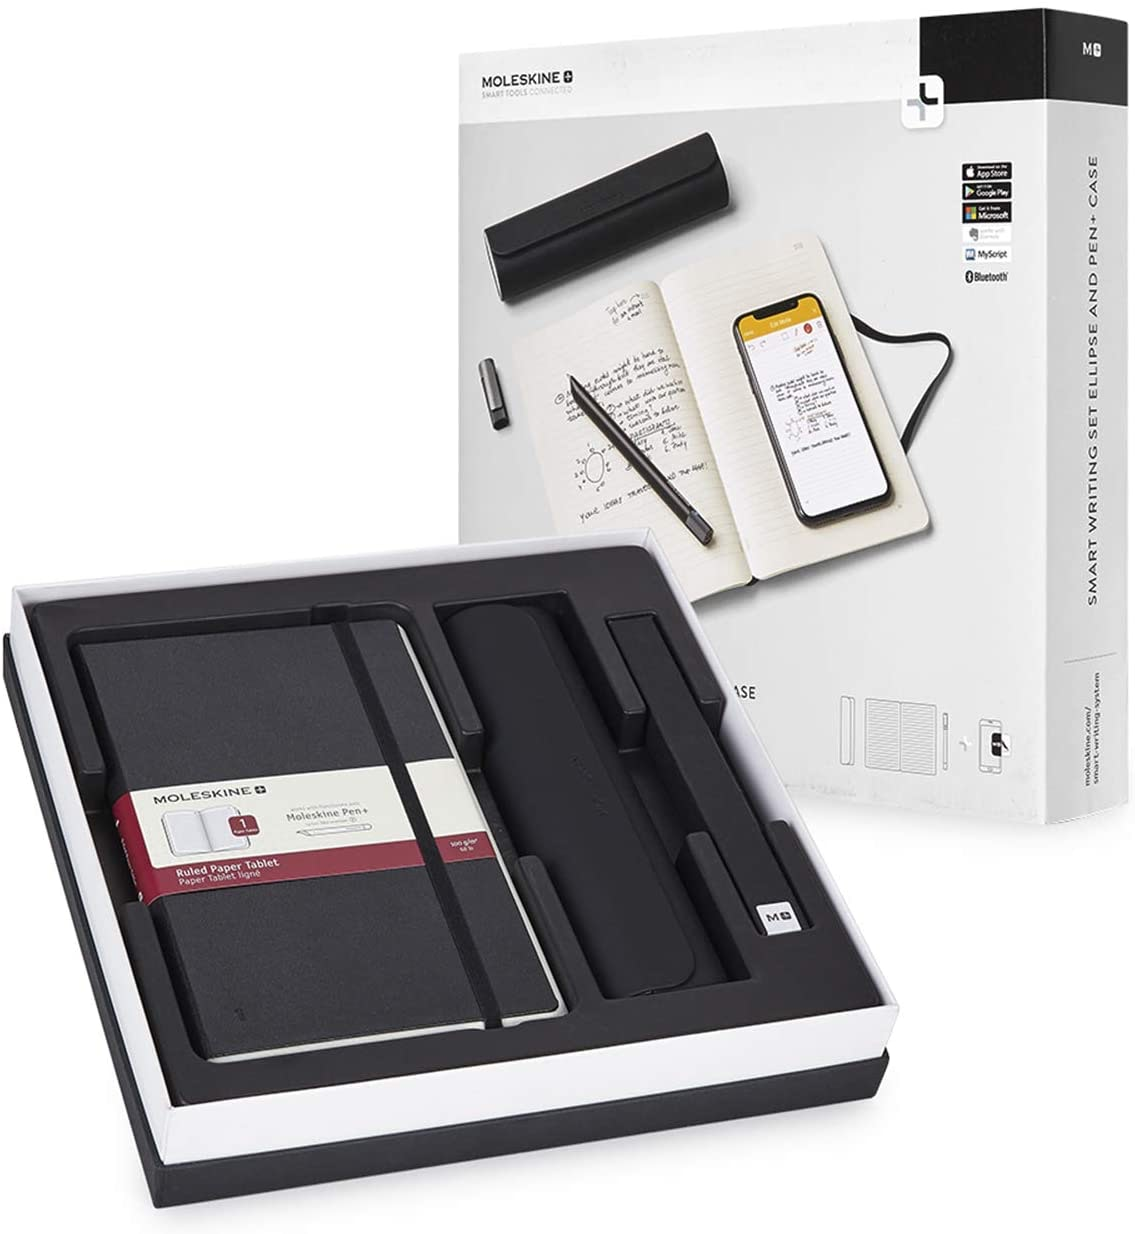 Moleskine Pen+ Ellipse Smart Writing Set